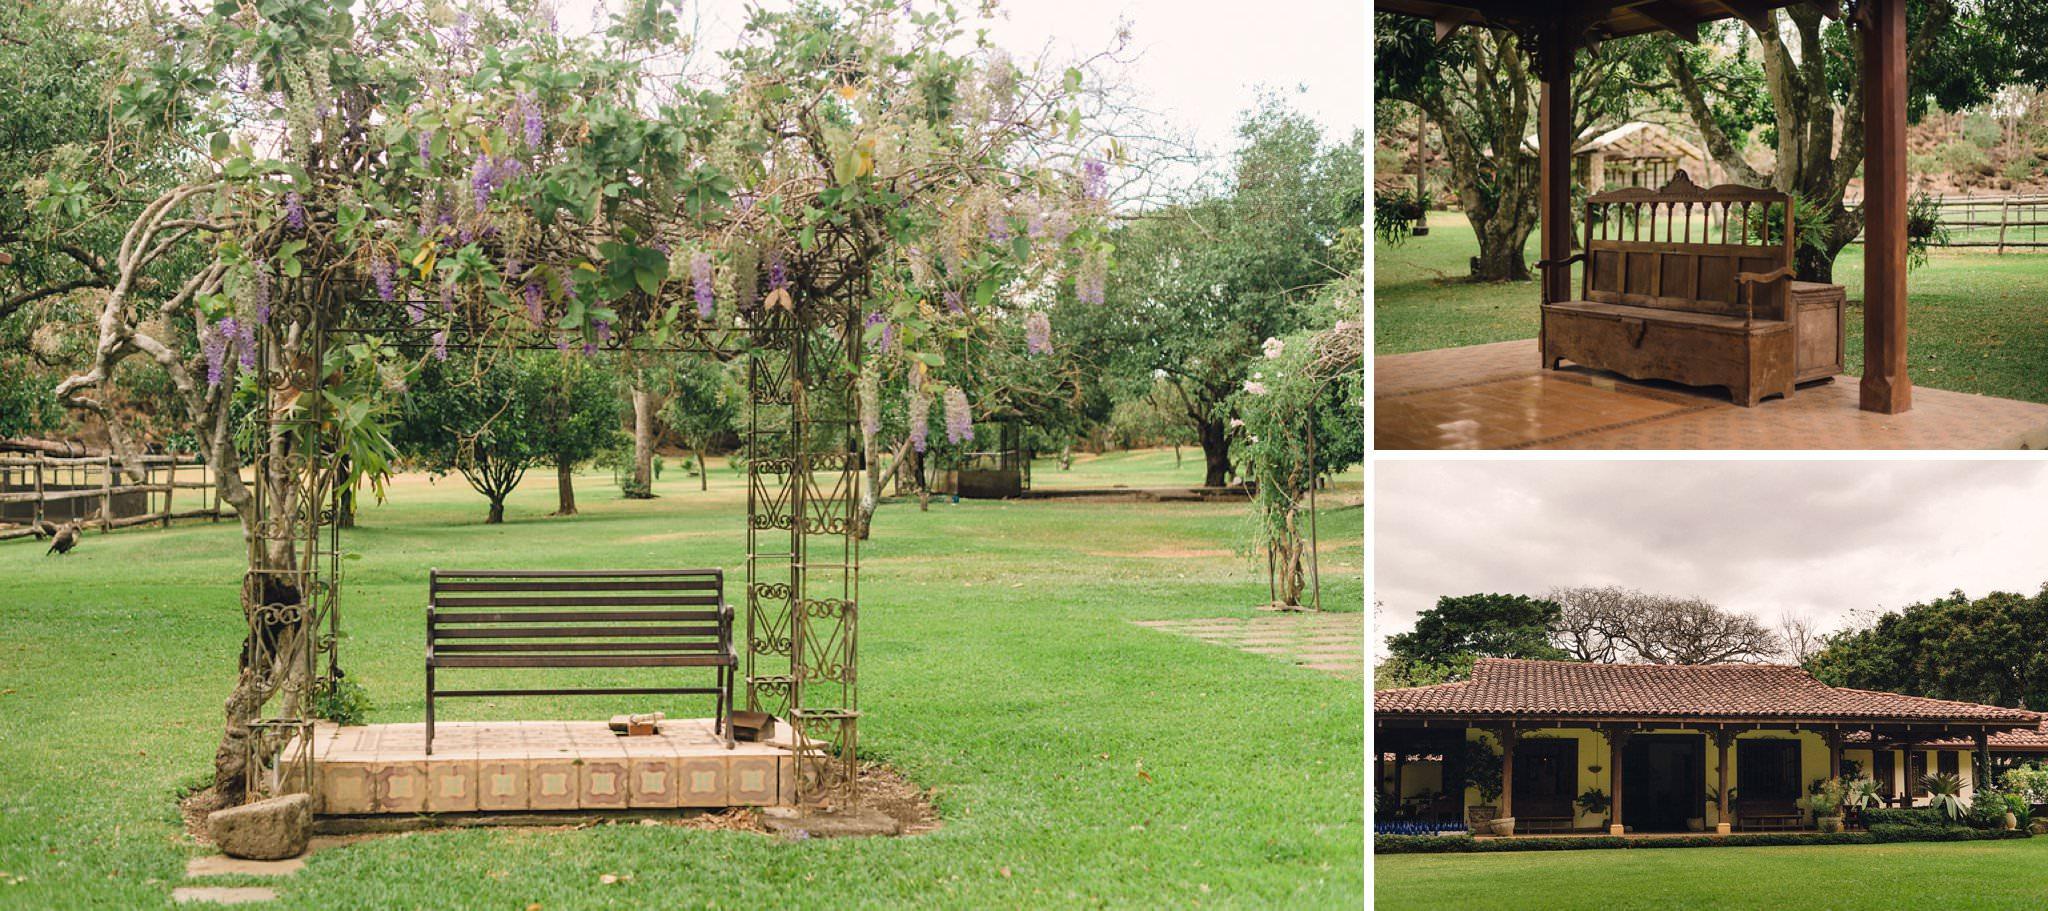 Matrimonio Catolico Costa Rica : Hermosos lugares casarse bodas costa rica exteriores